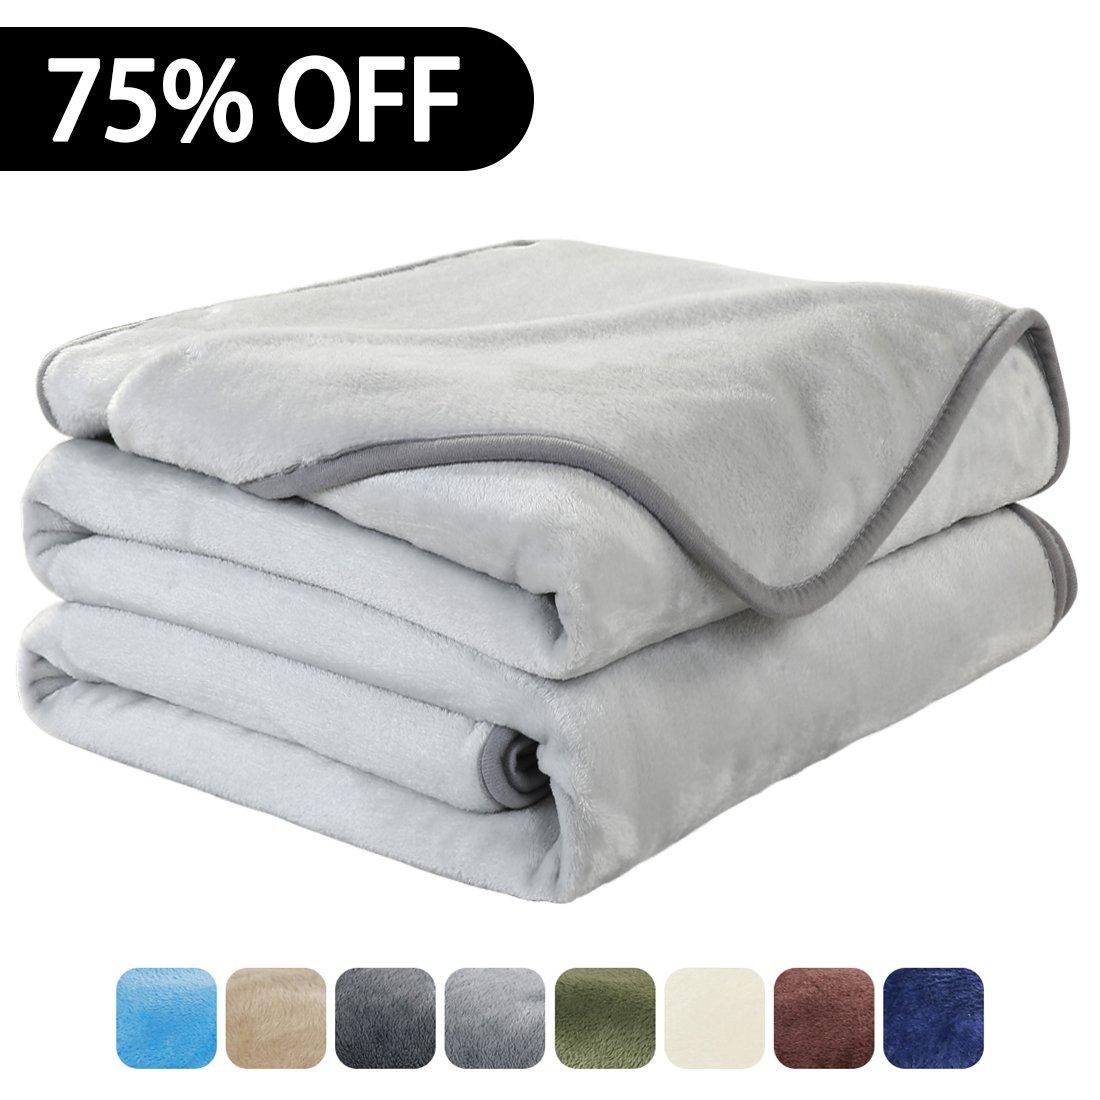 Luxury Fleece Super Soft Thermal Blanket Warm Fuzzy Microplush Lightweight Blankets for Bed Sofa